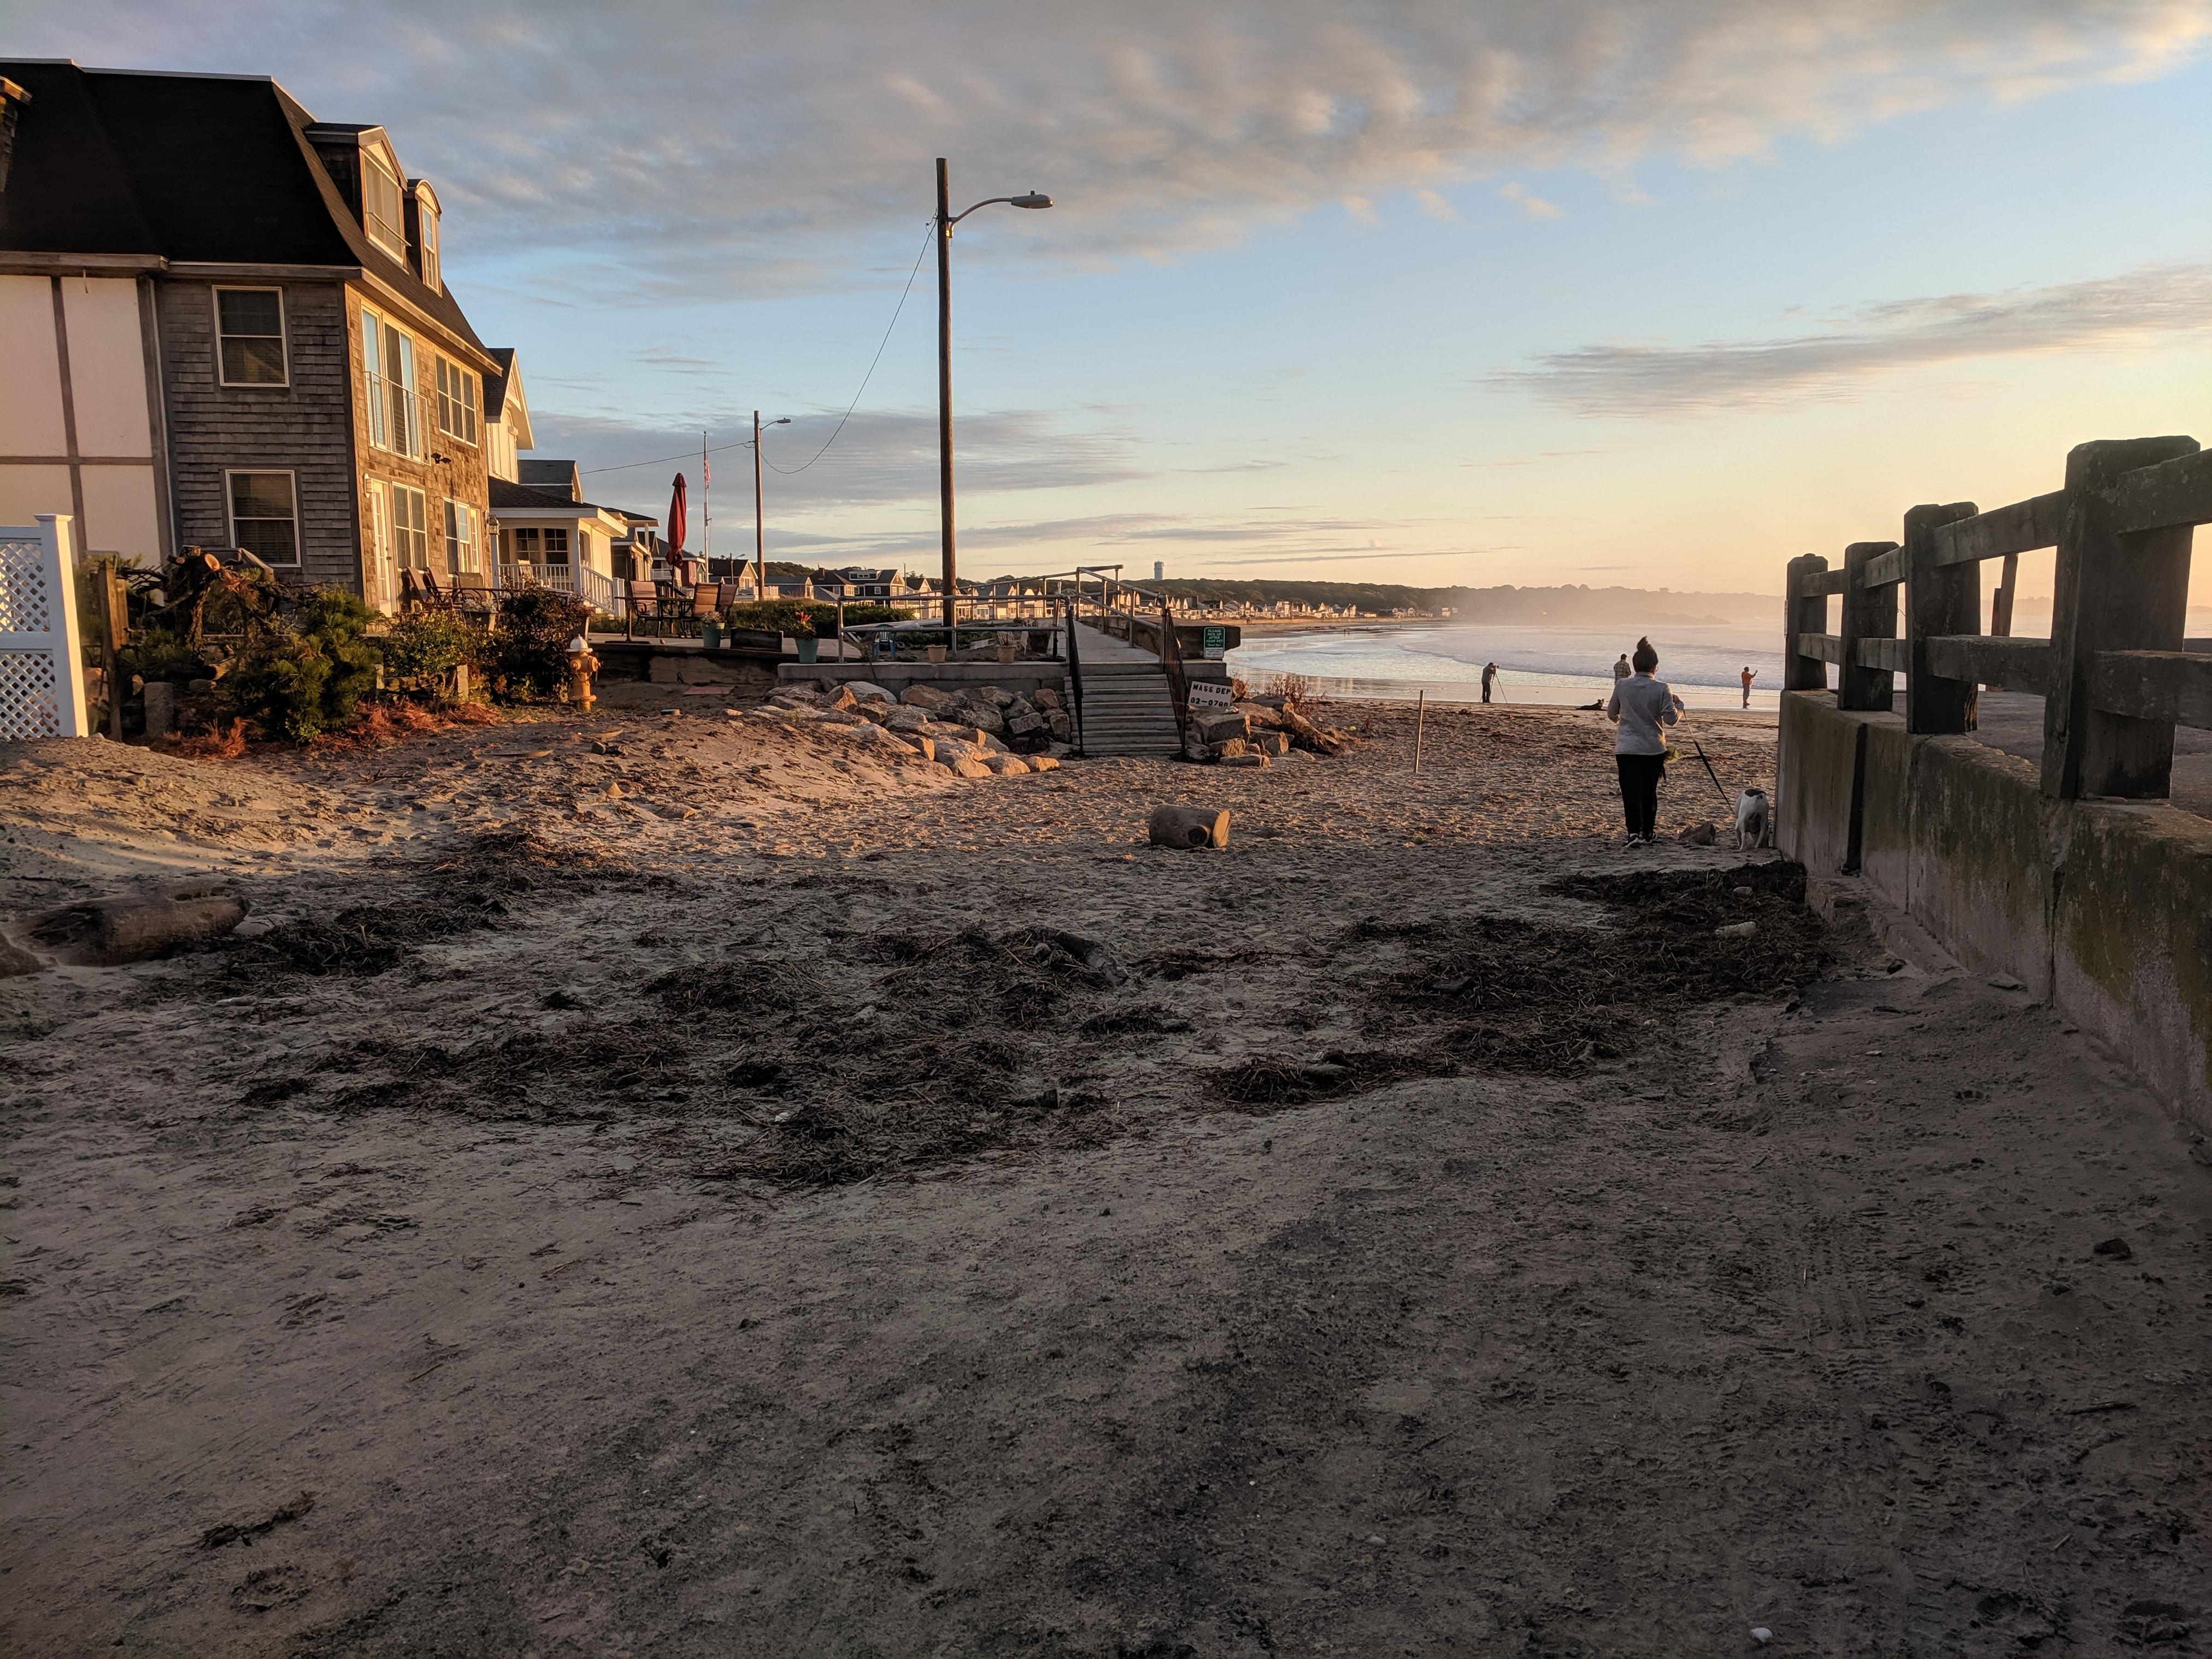 high tide did not reach street _20191013_©c ryan.jpg